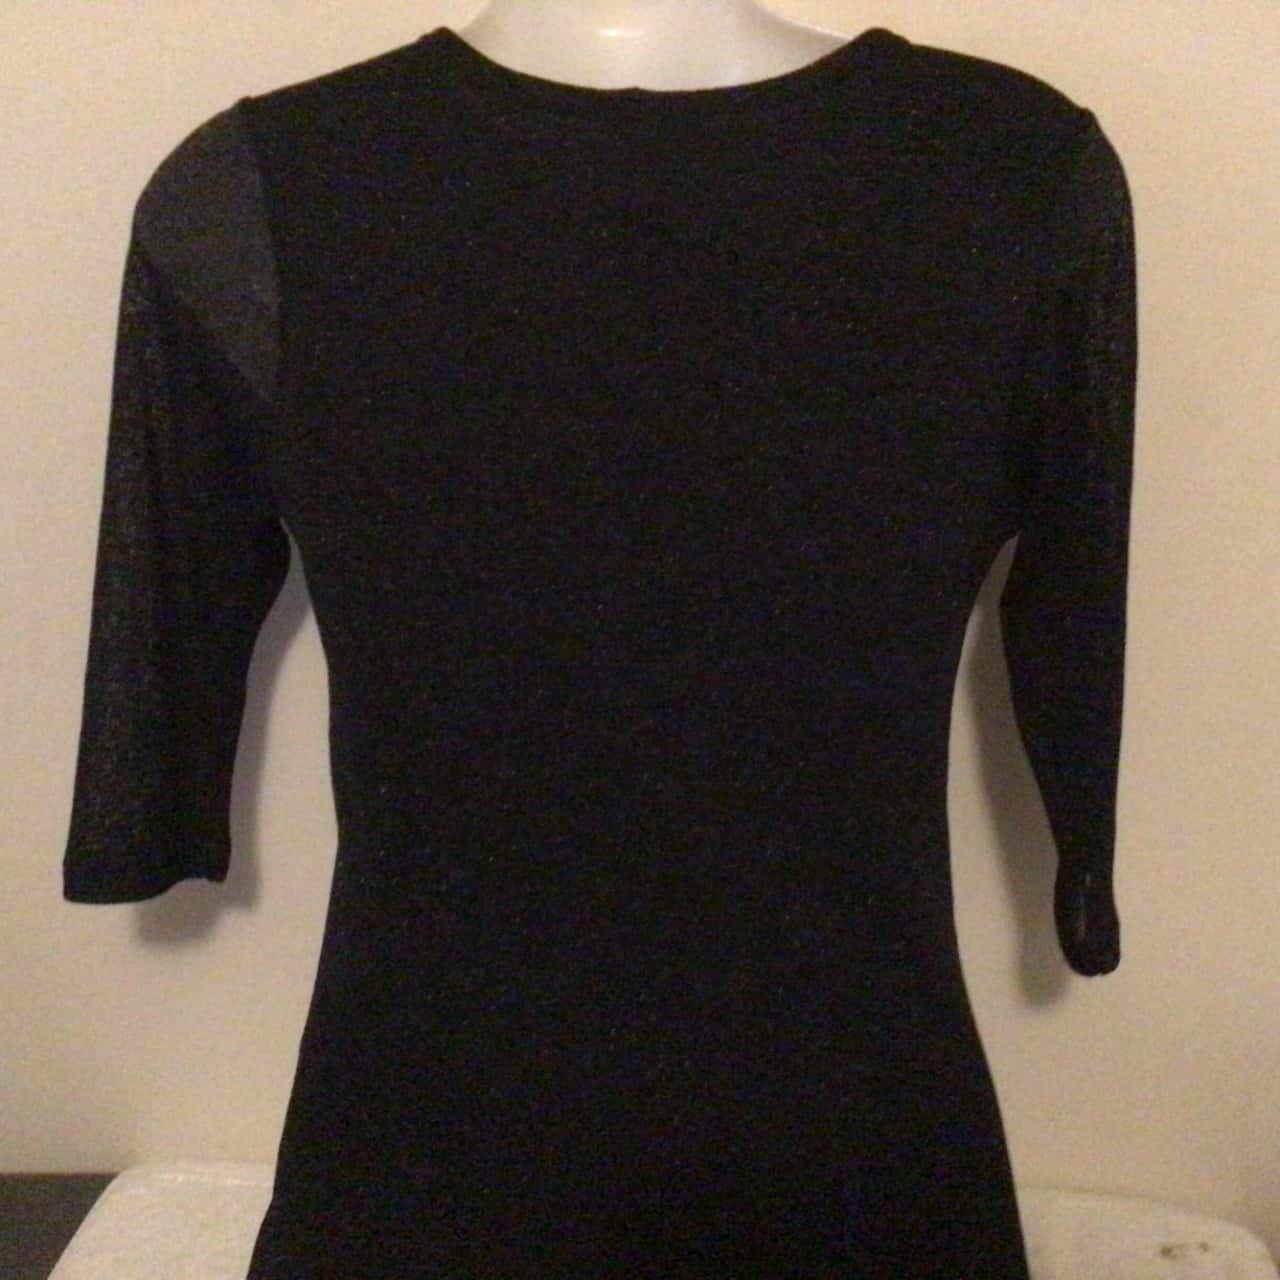 MATERNITY Womens RIPE MATERNITY FORMAL BLACK SHIMMER (SilverFlecks) DRESS  Size S Midi Dress